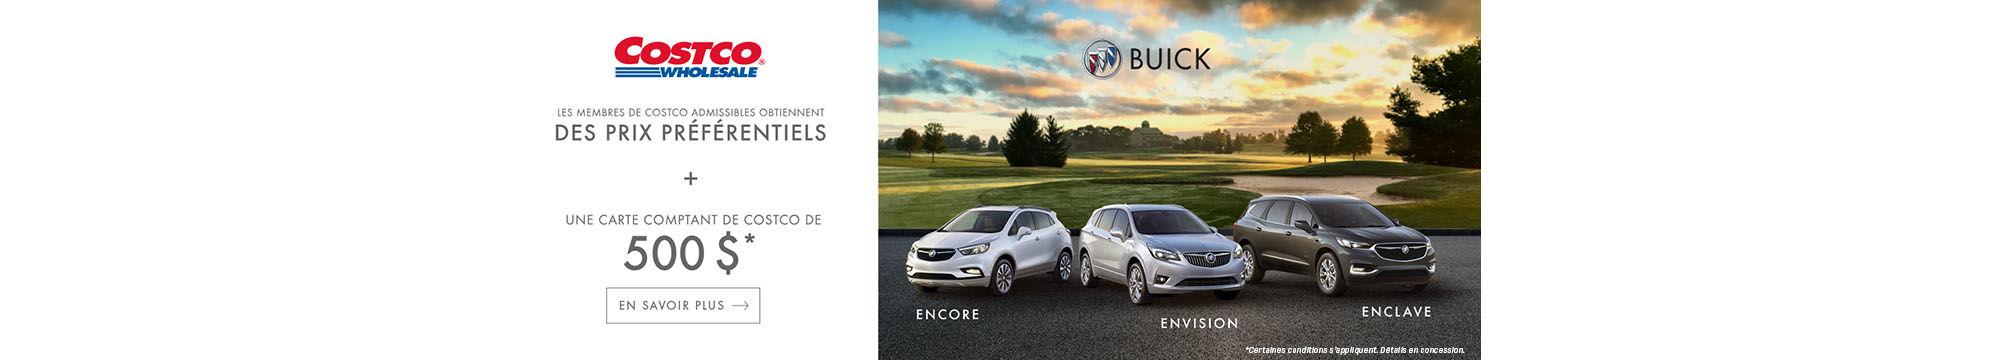 Costco - Prix préférentiel Buick